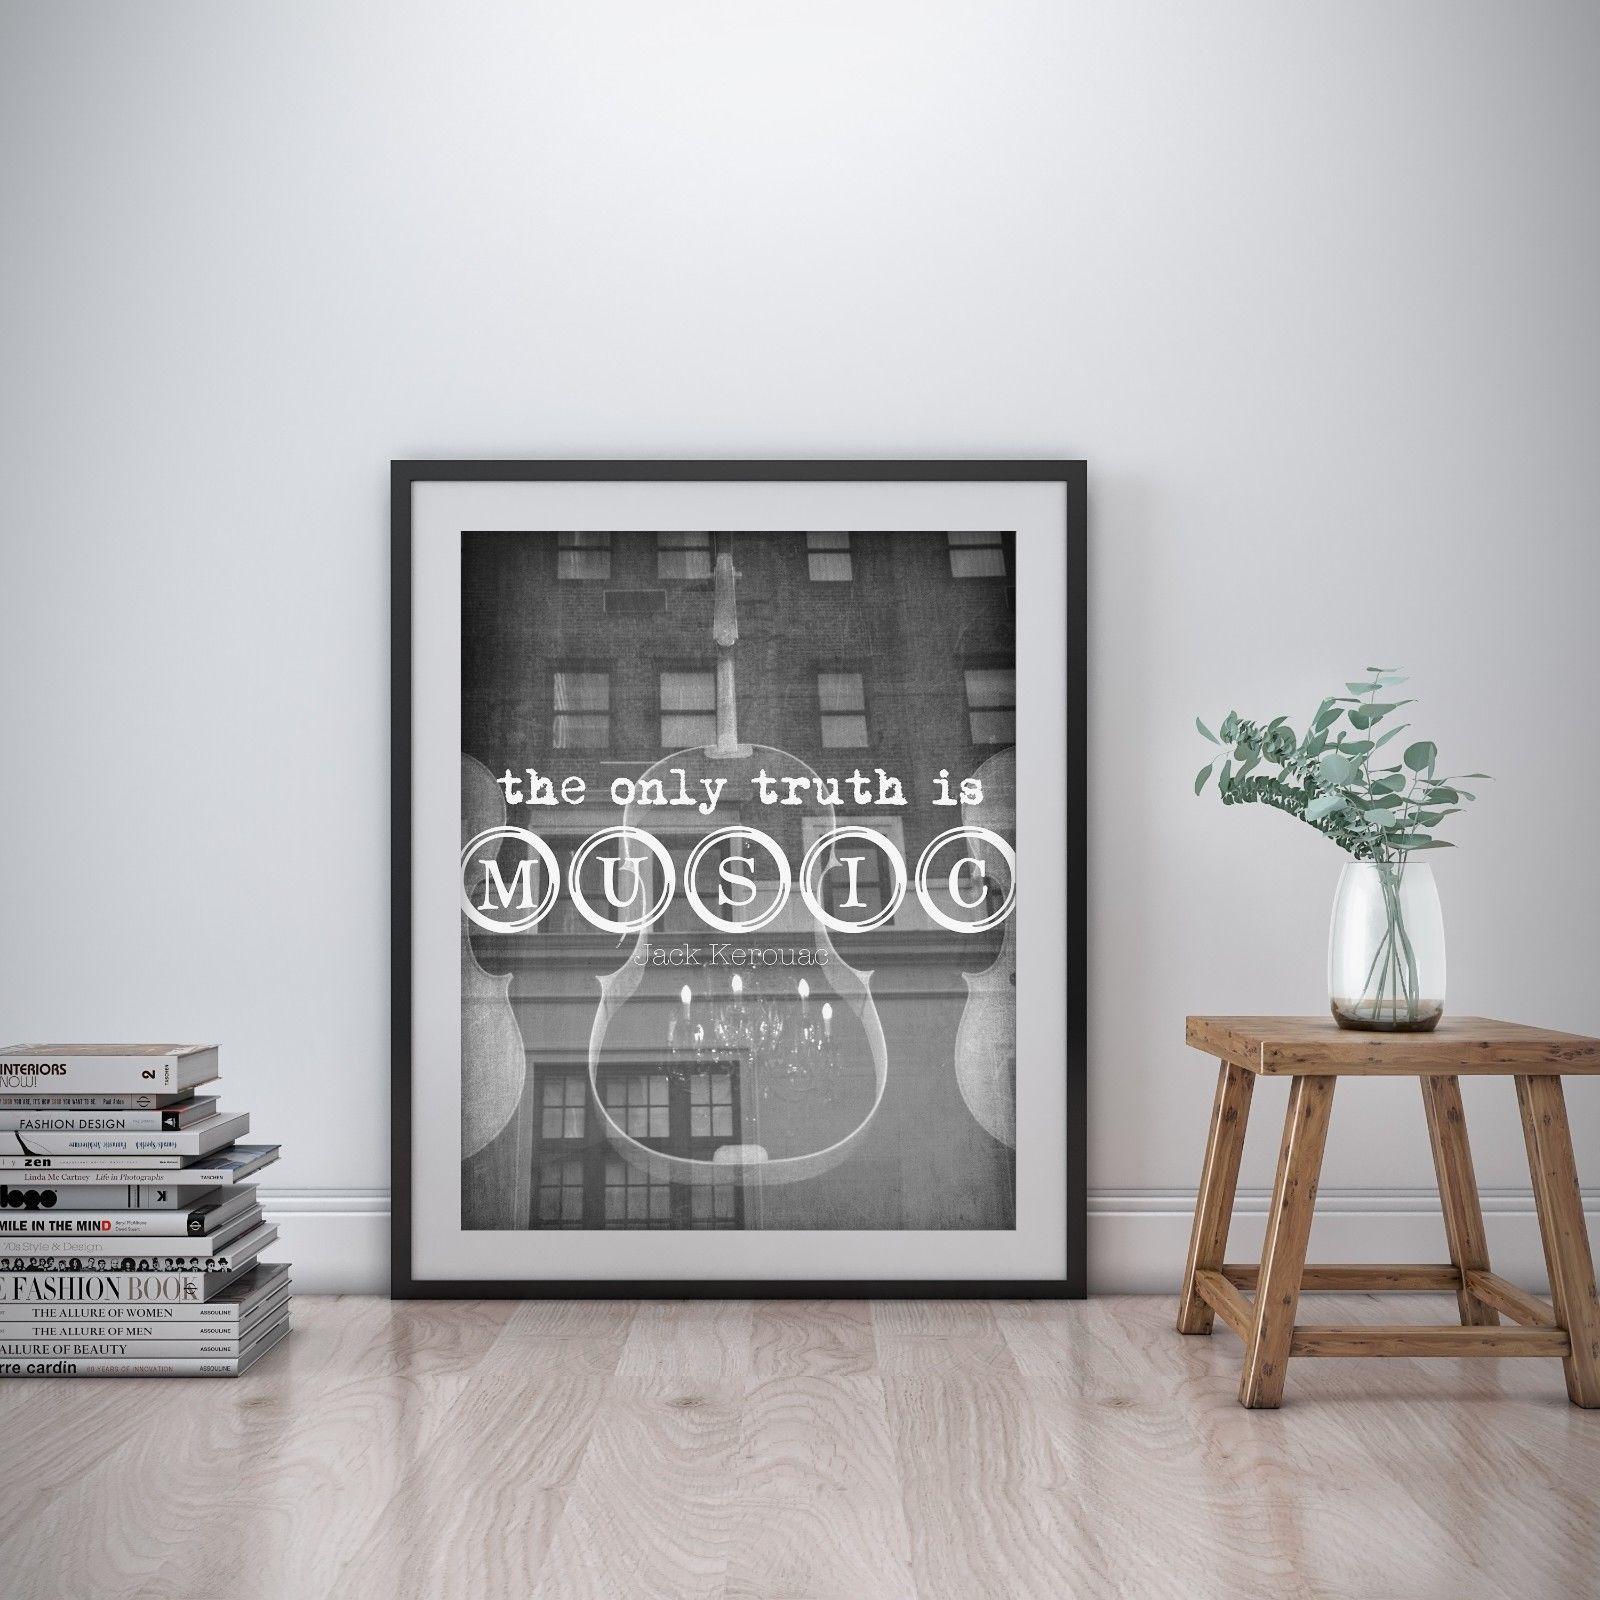 Details about Jack Kerouac Inspirational Wall Art Print ...